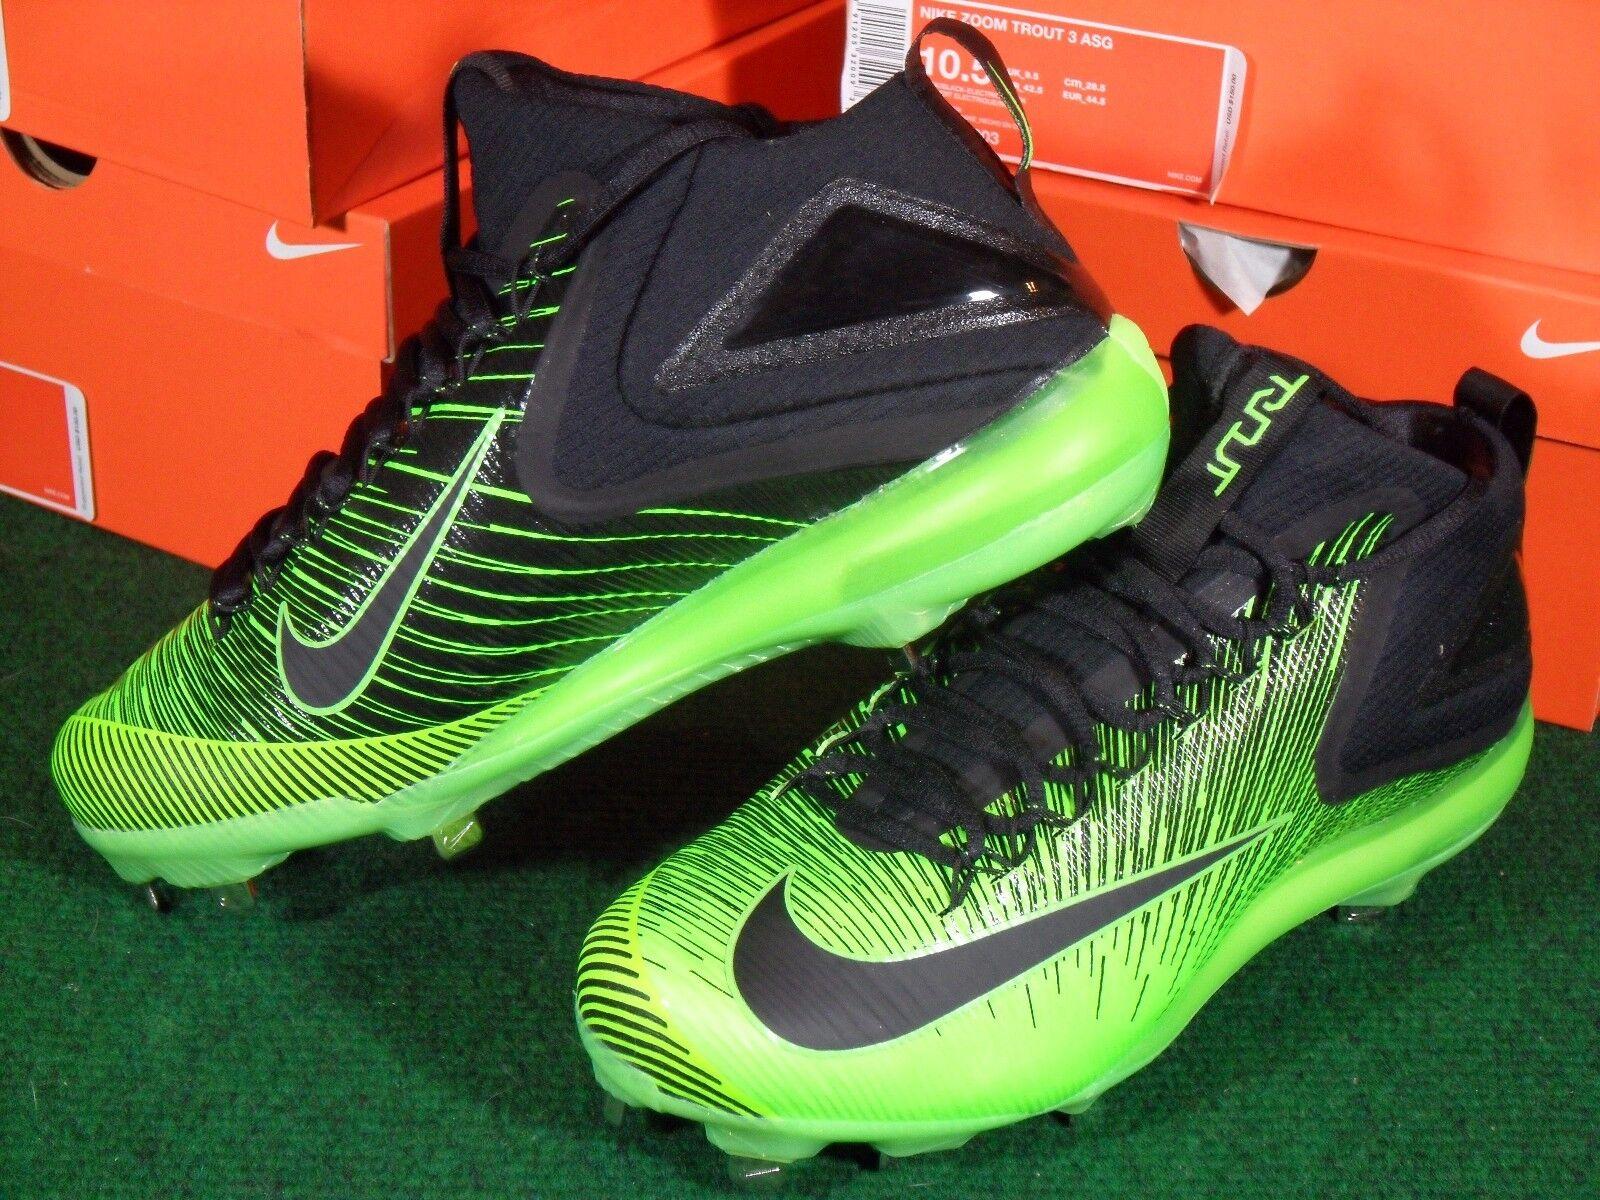 nike vapor zoom tennis shoes green baseball cleats